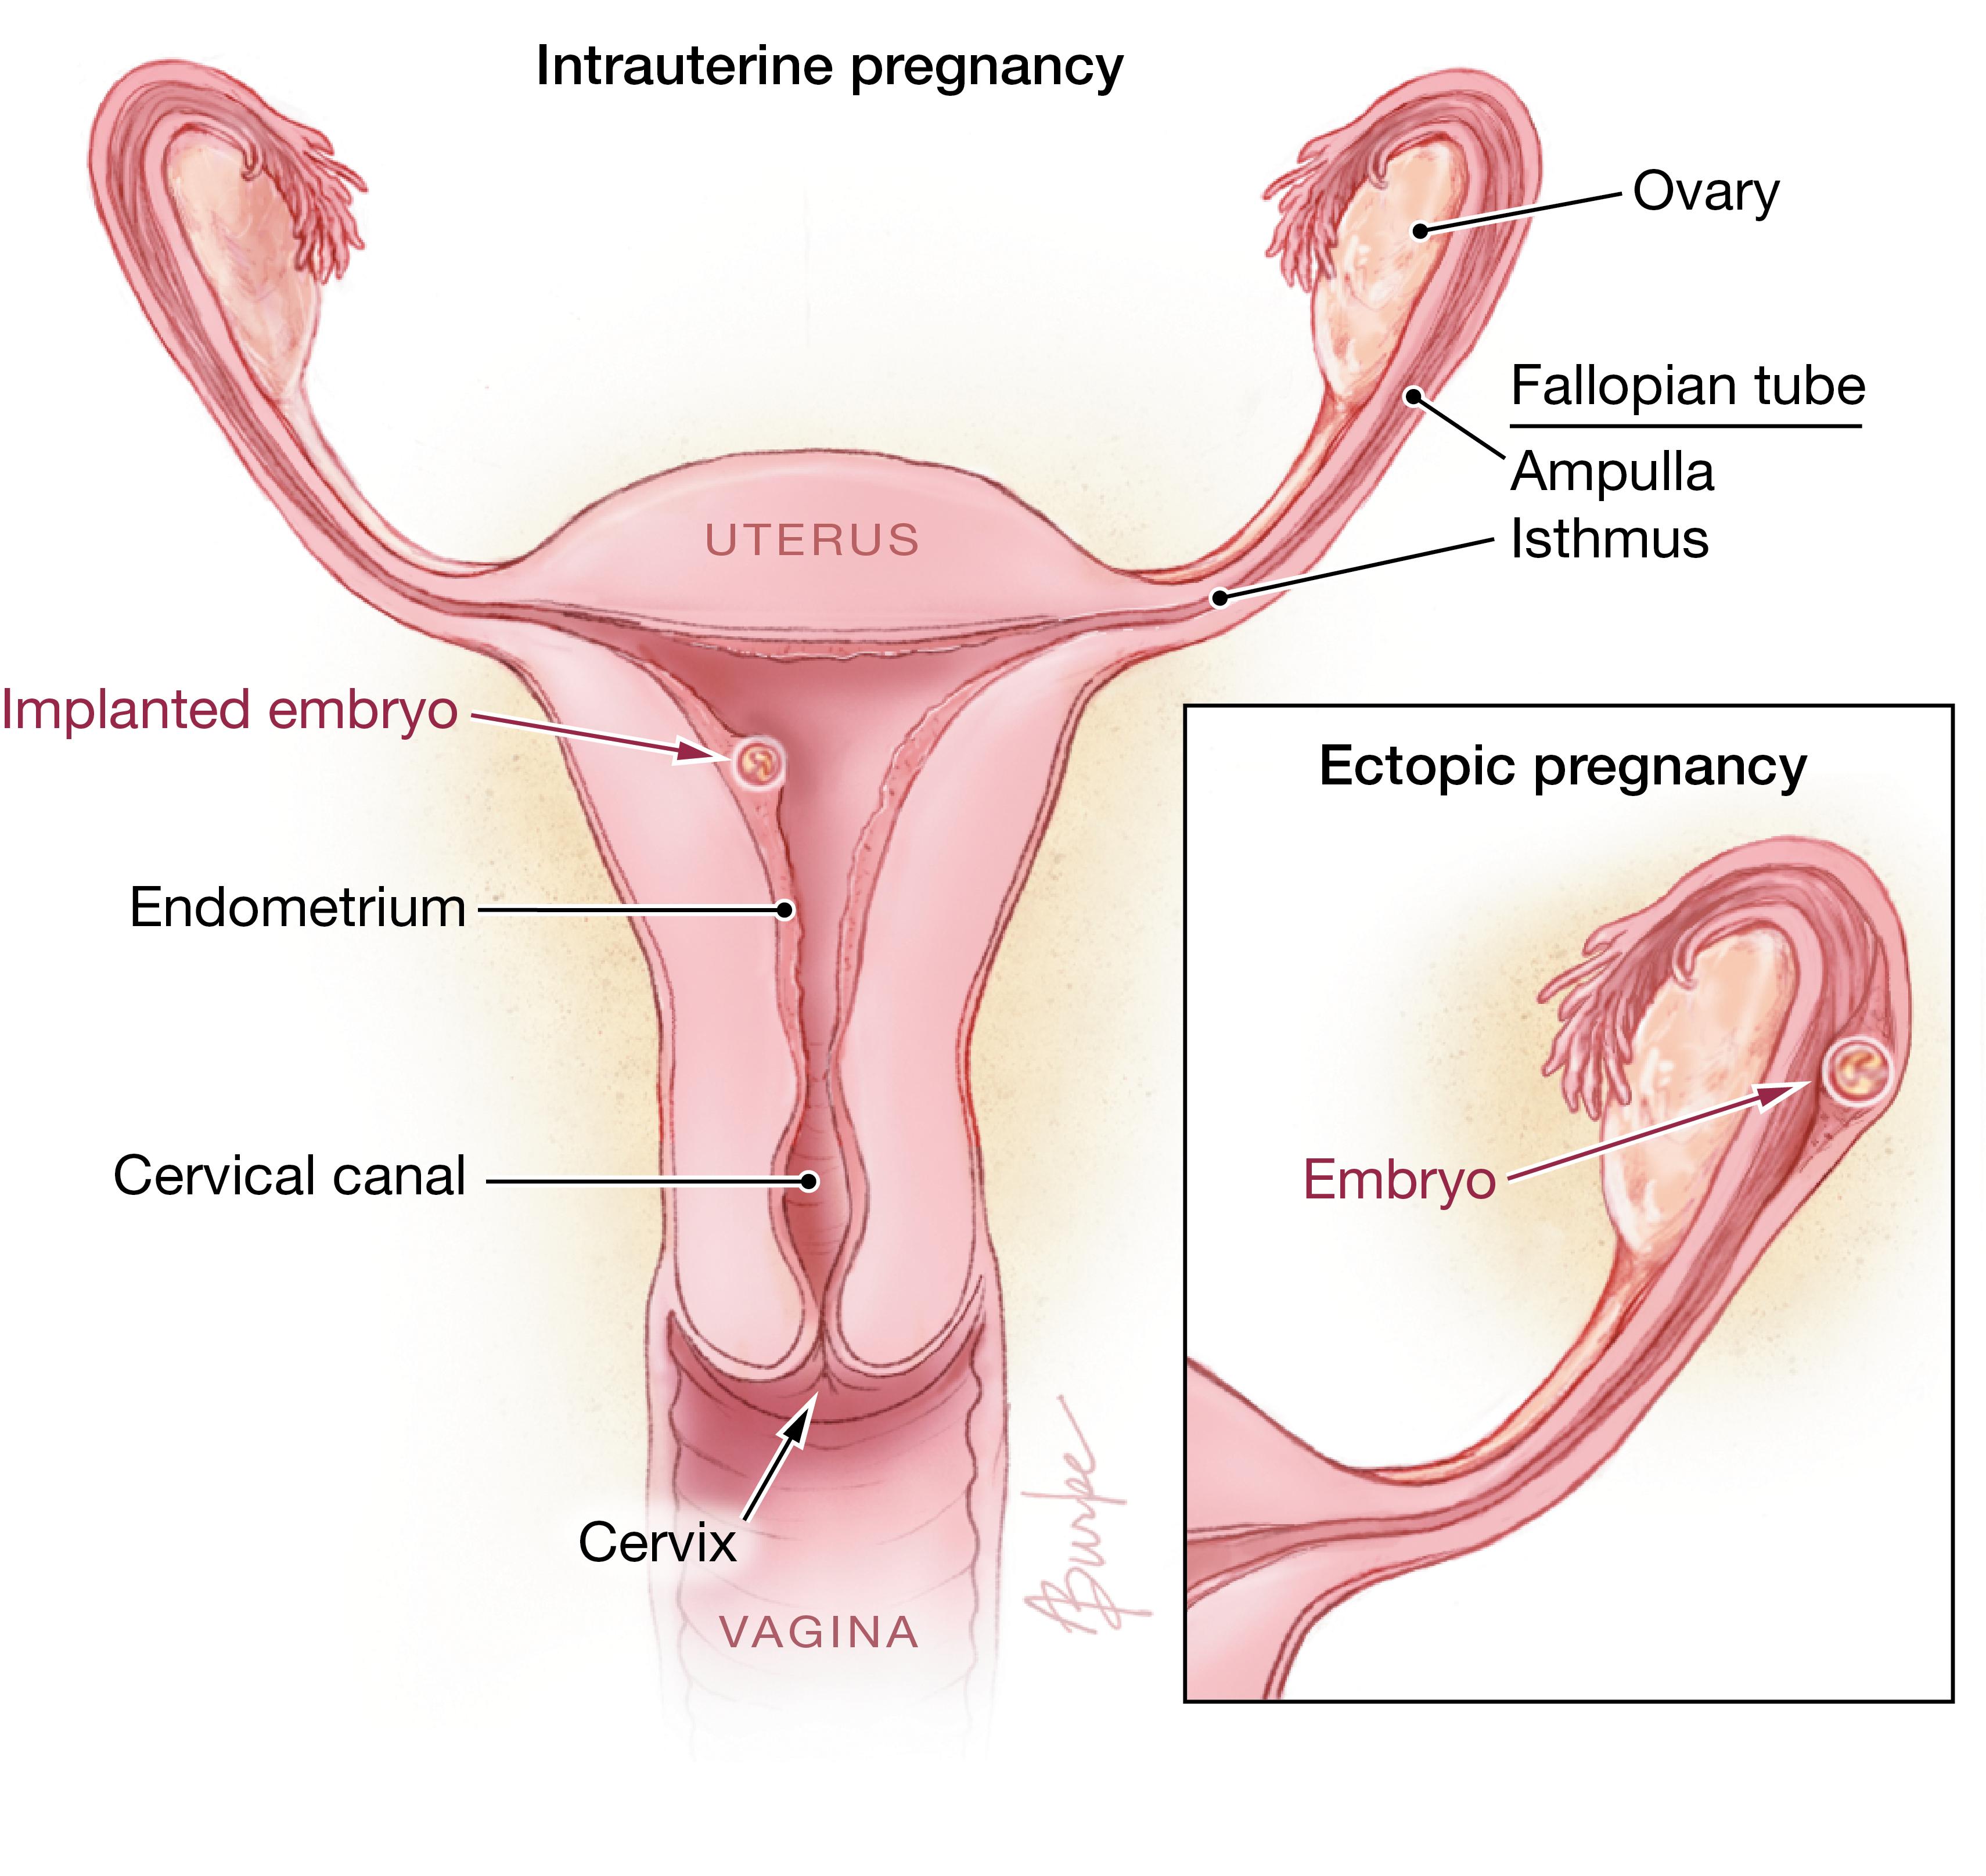 Ectopic Pregnancy Pregnancy Jama Jama Network